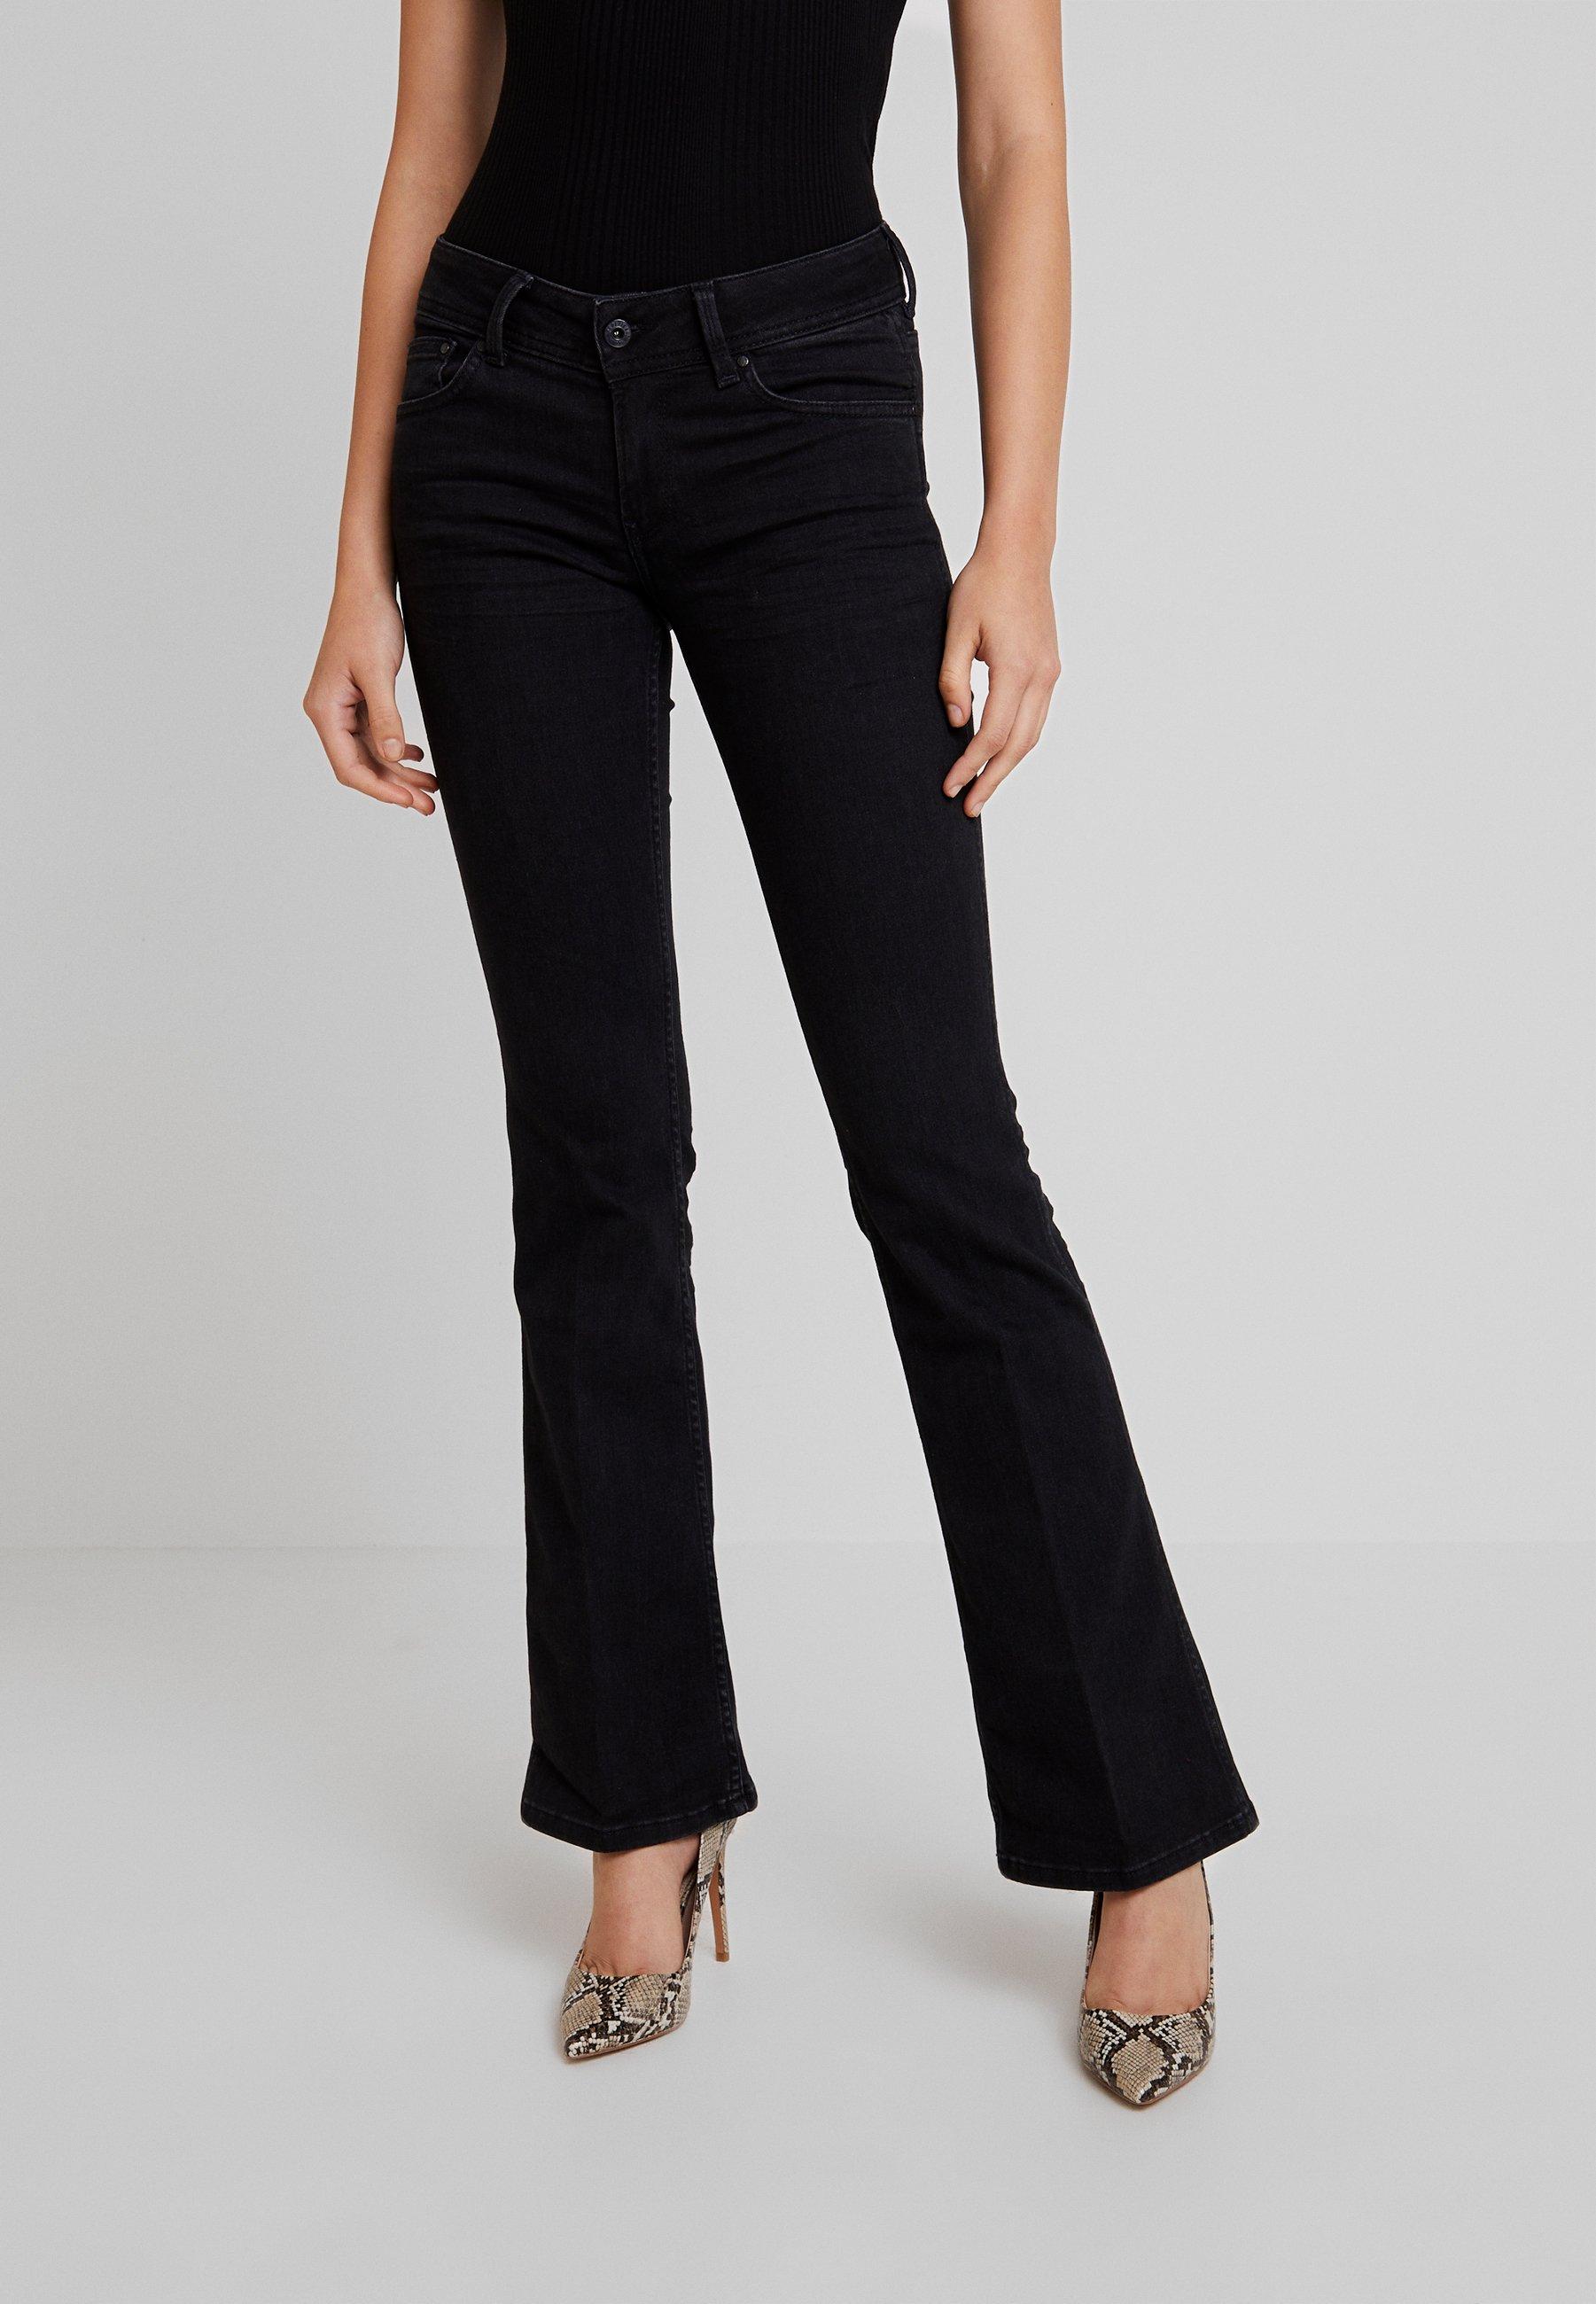 PimlicoJean Jeans Flare Pepe New Black 0PkOXwZN8n